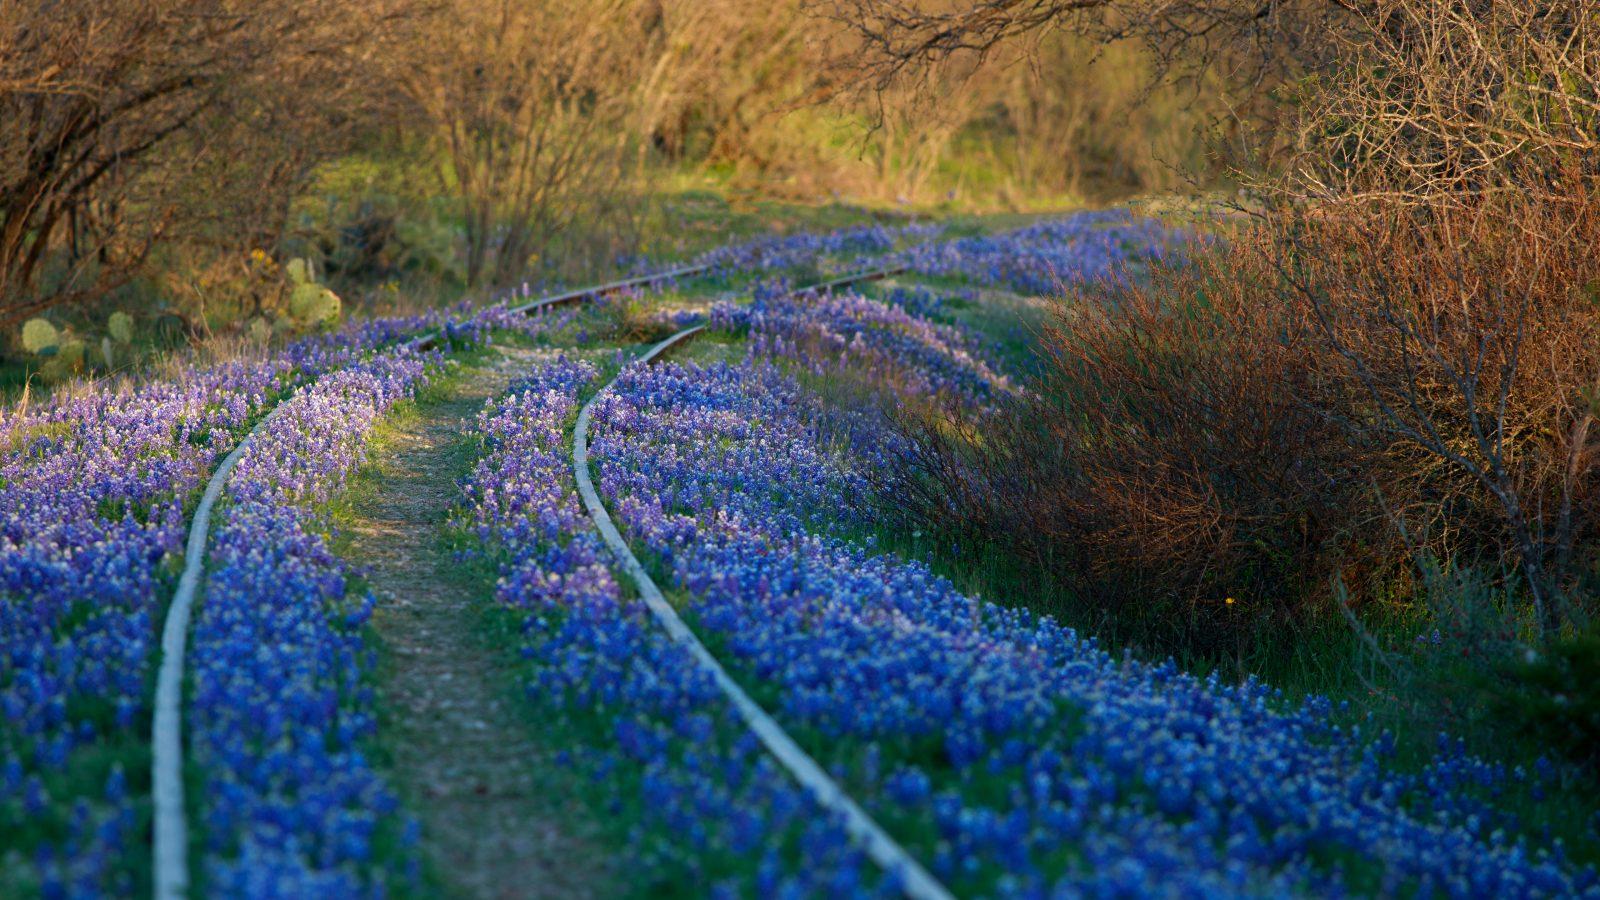 Bluebonnets grow over abandoned railroad tracks.